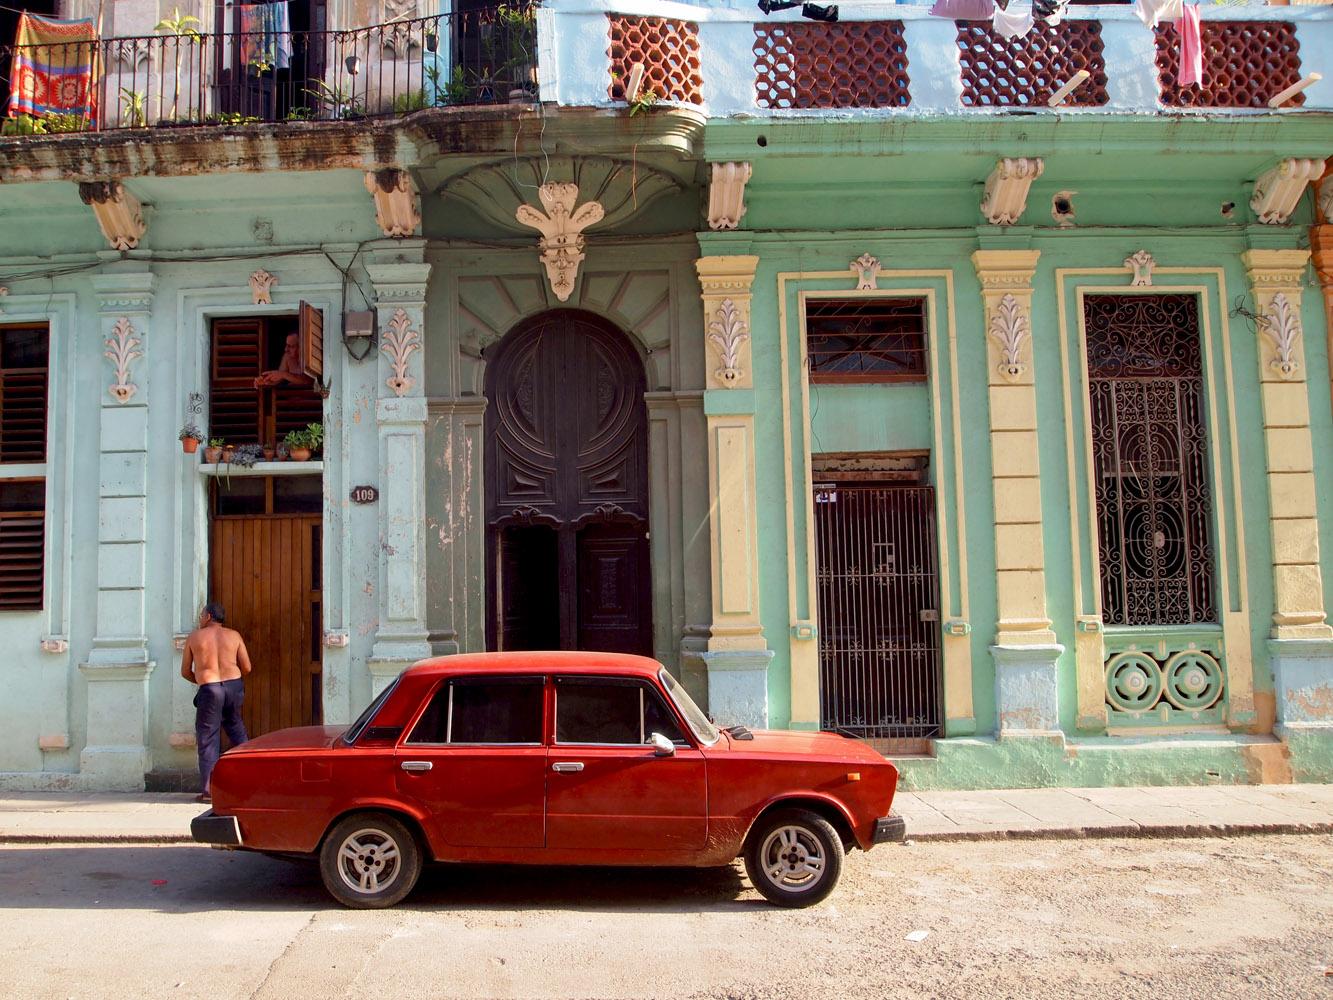 Cuba-Havana-Old-Man-Red-Russian-car